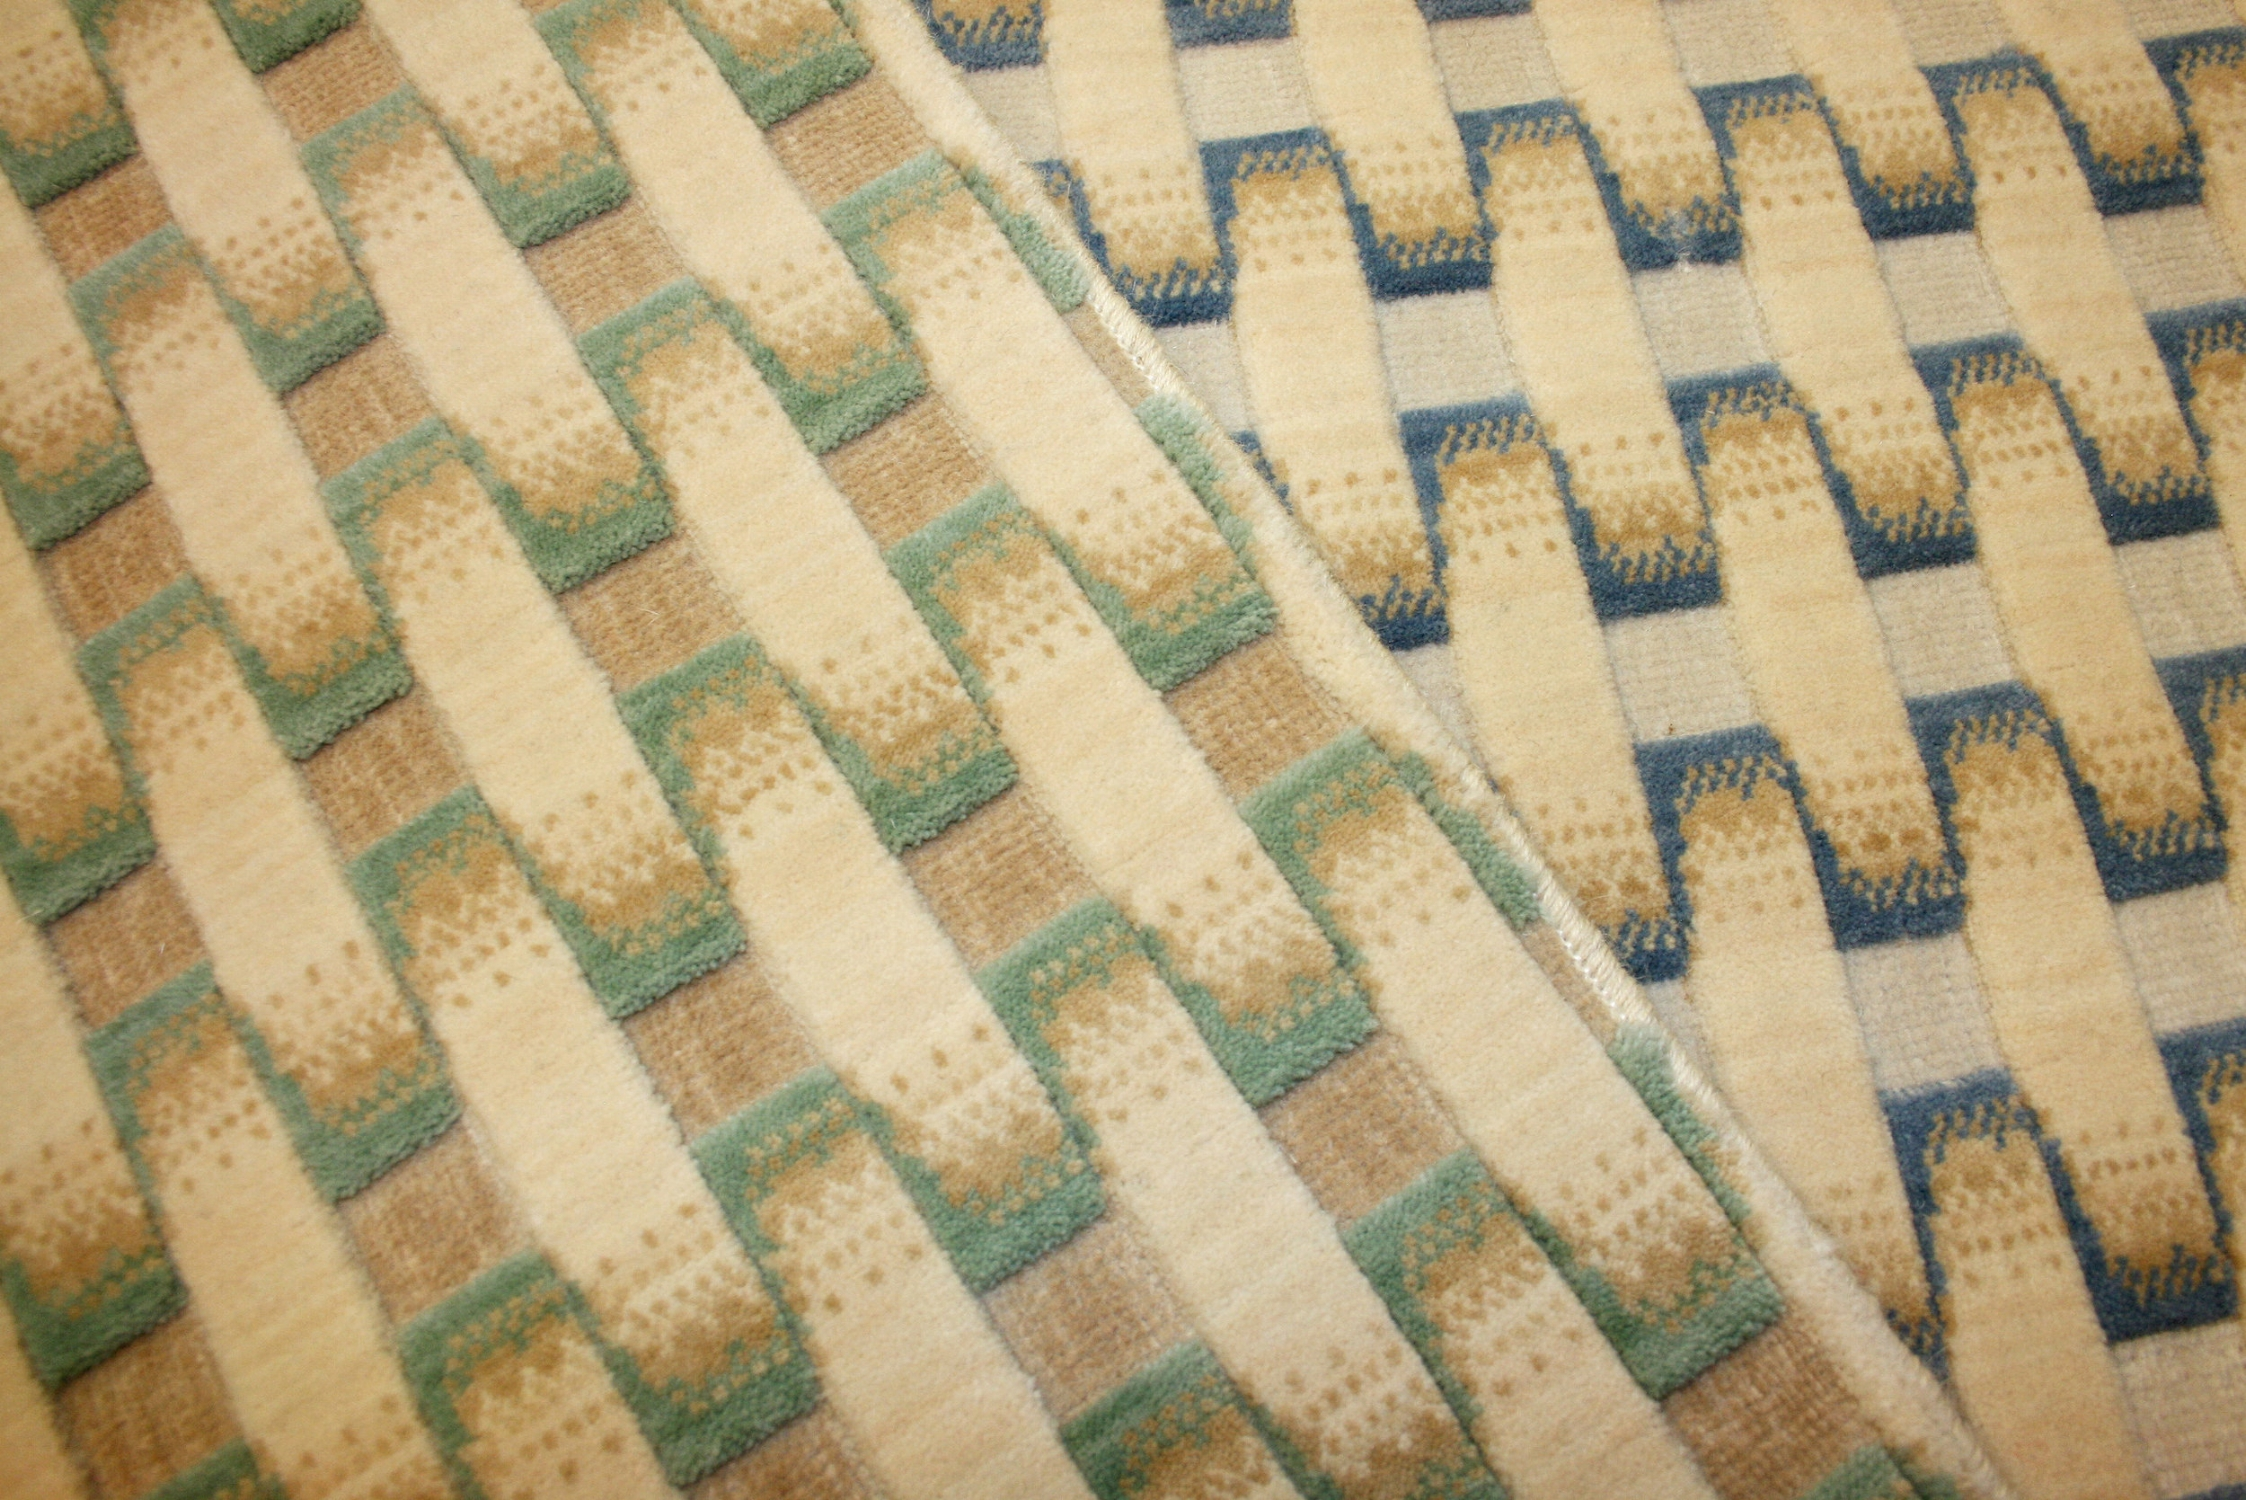 Basket-weave patterned high-low wool carpet